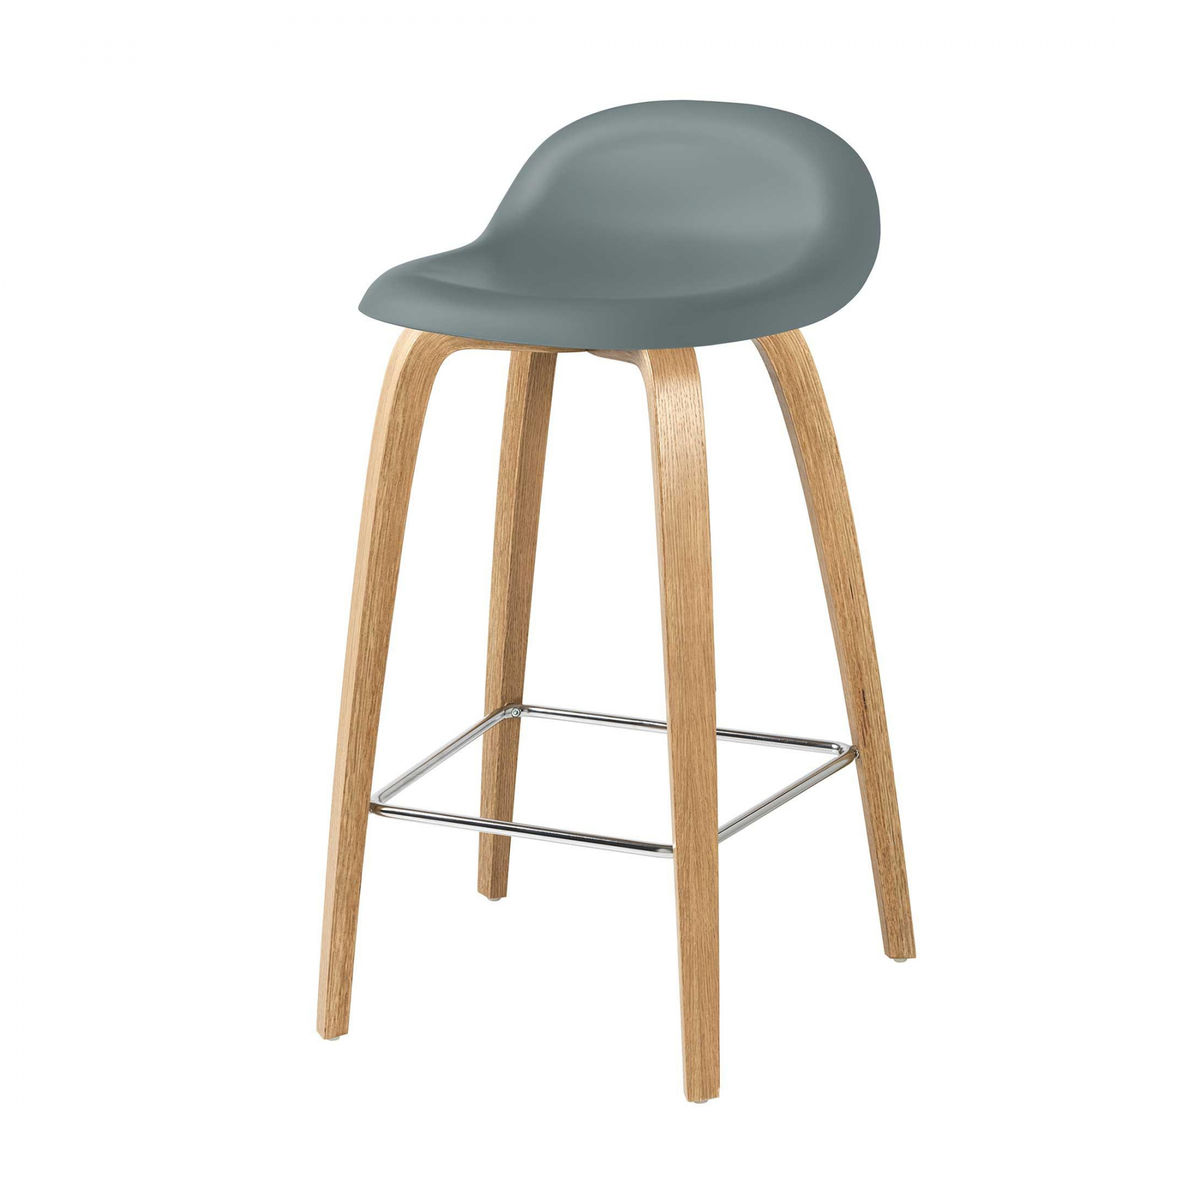 3d counter stool barhocker mit eichengestell gubi for Barhocker 3d